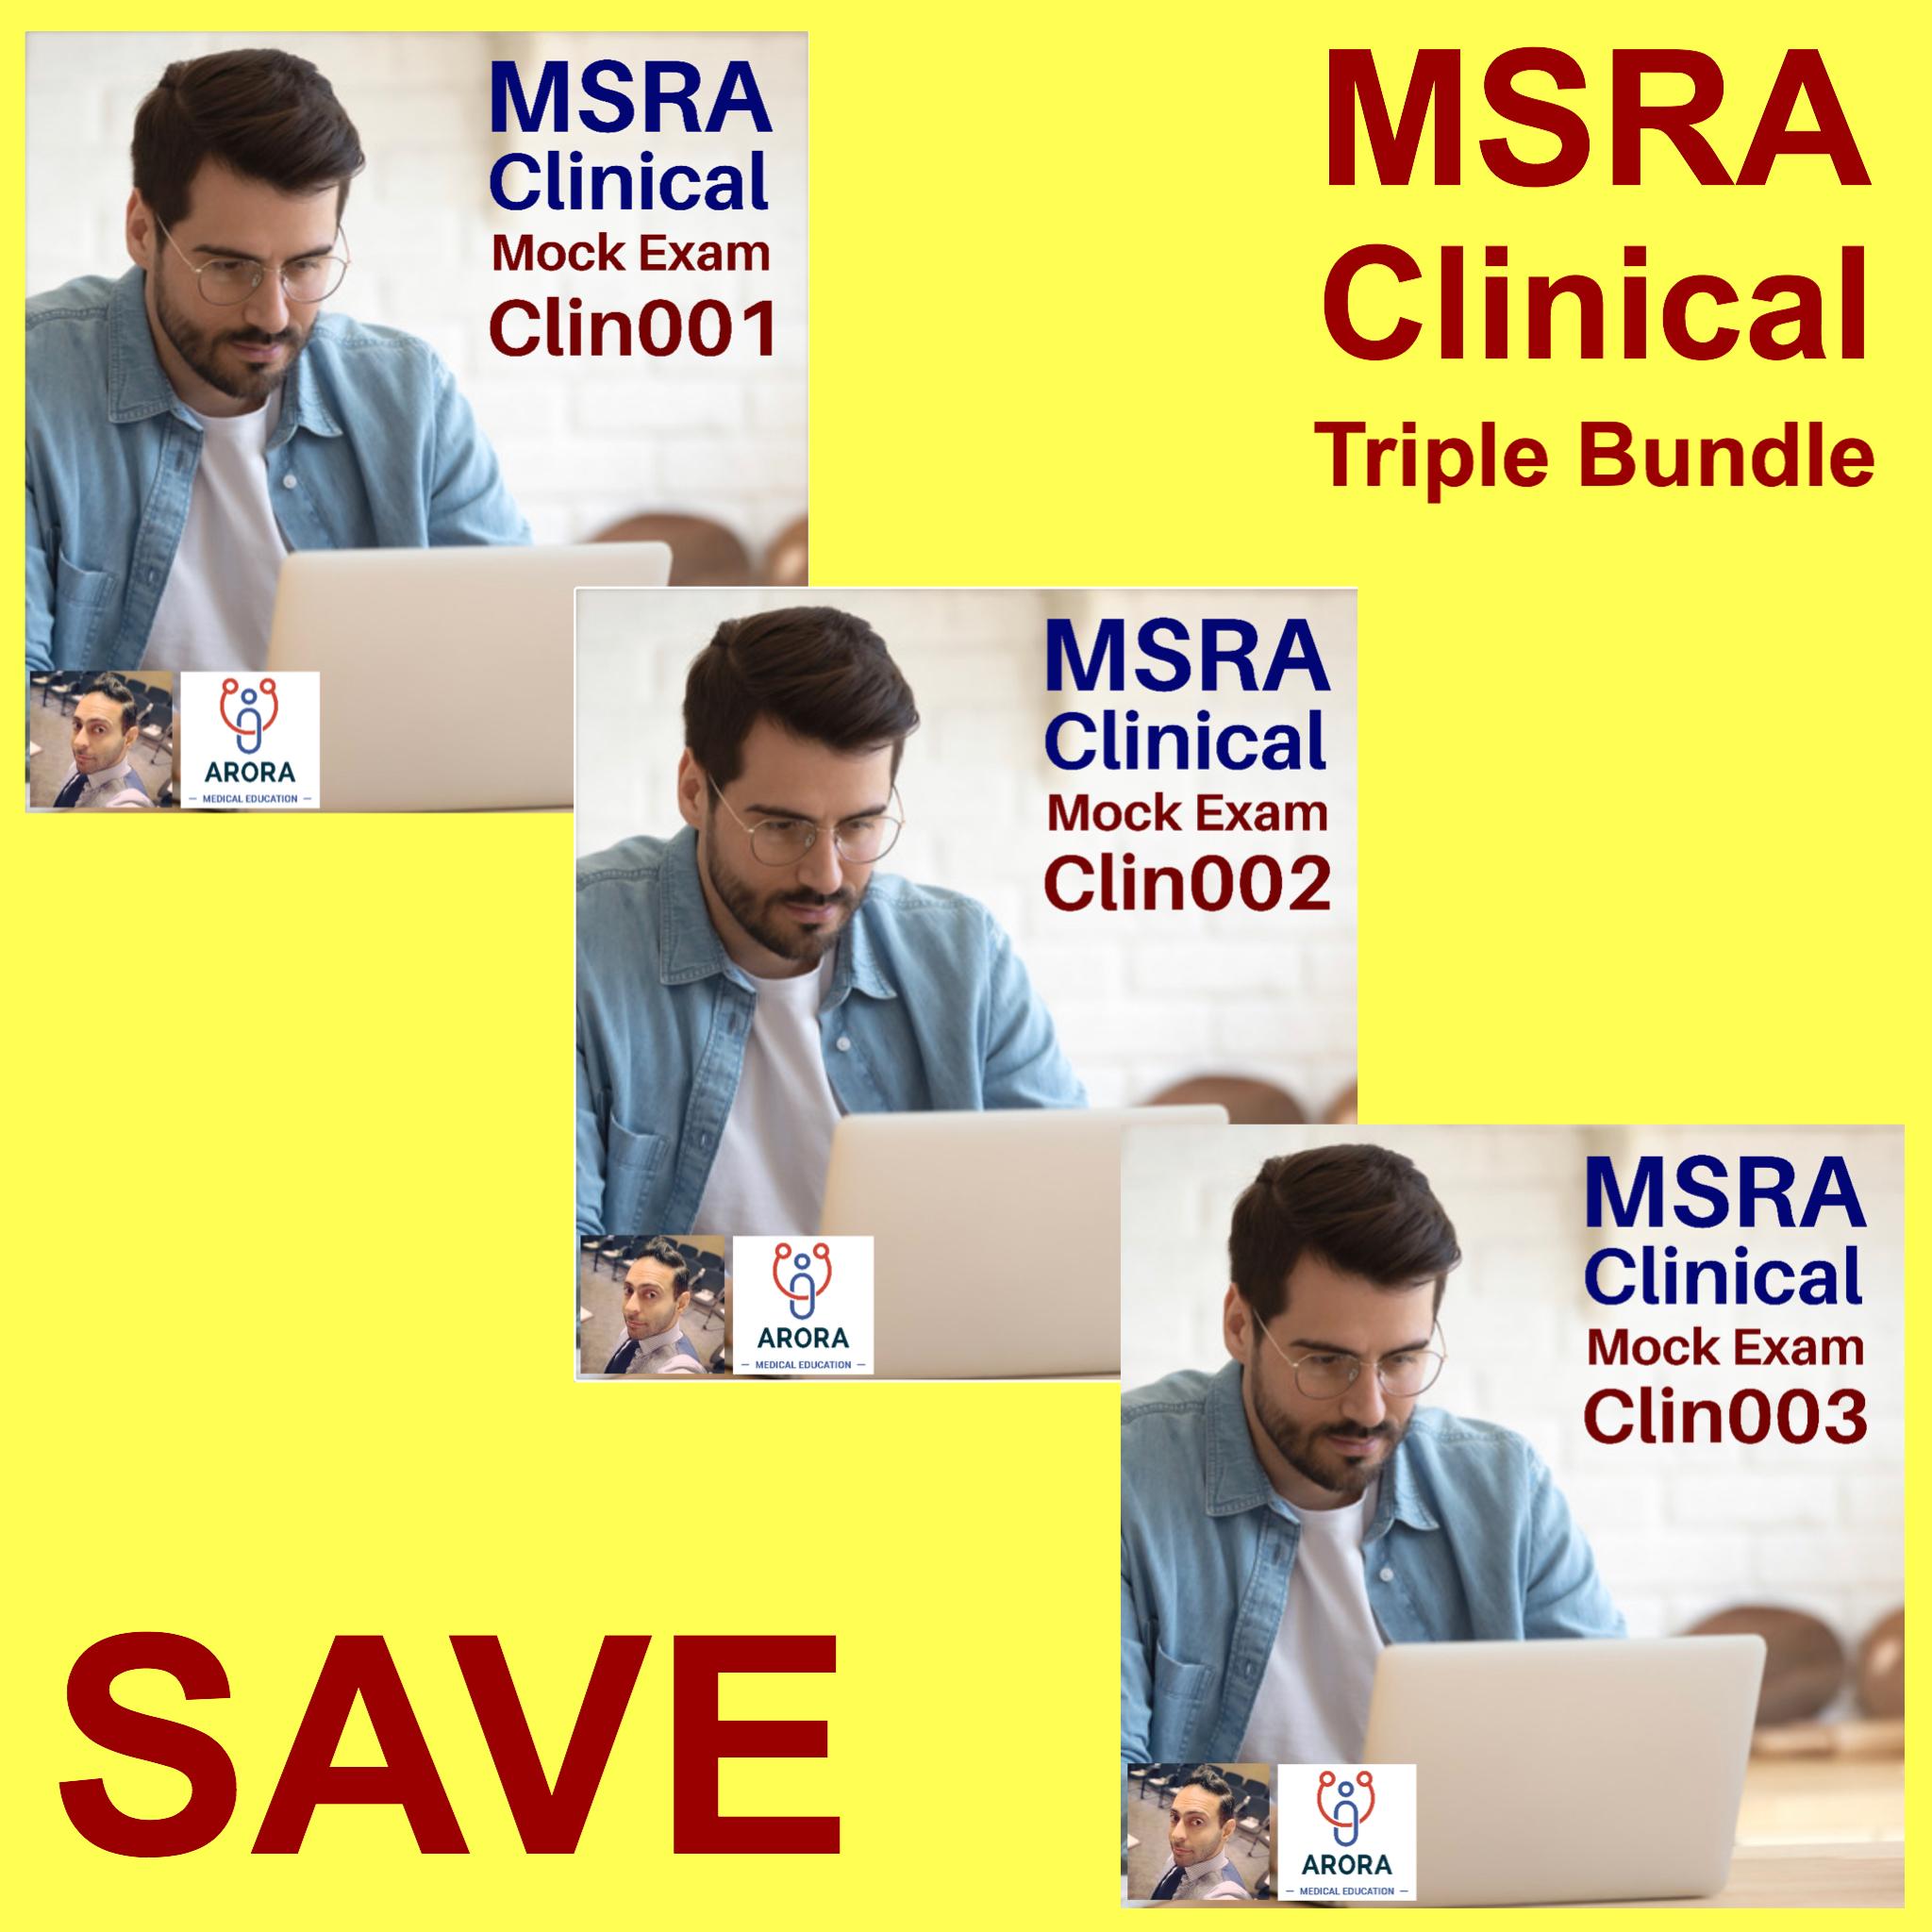 MSRAClinBndl - MRCGP CSA, AKT and PLAB Exam Courses and Online Webinars - Arora Medical Education